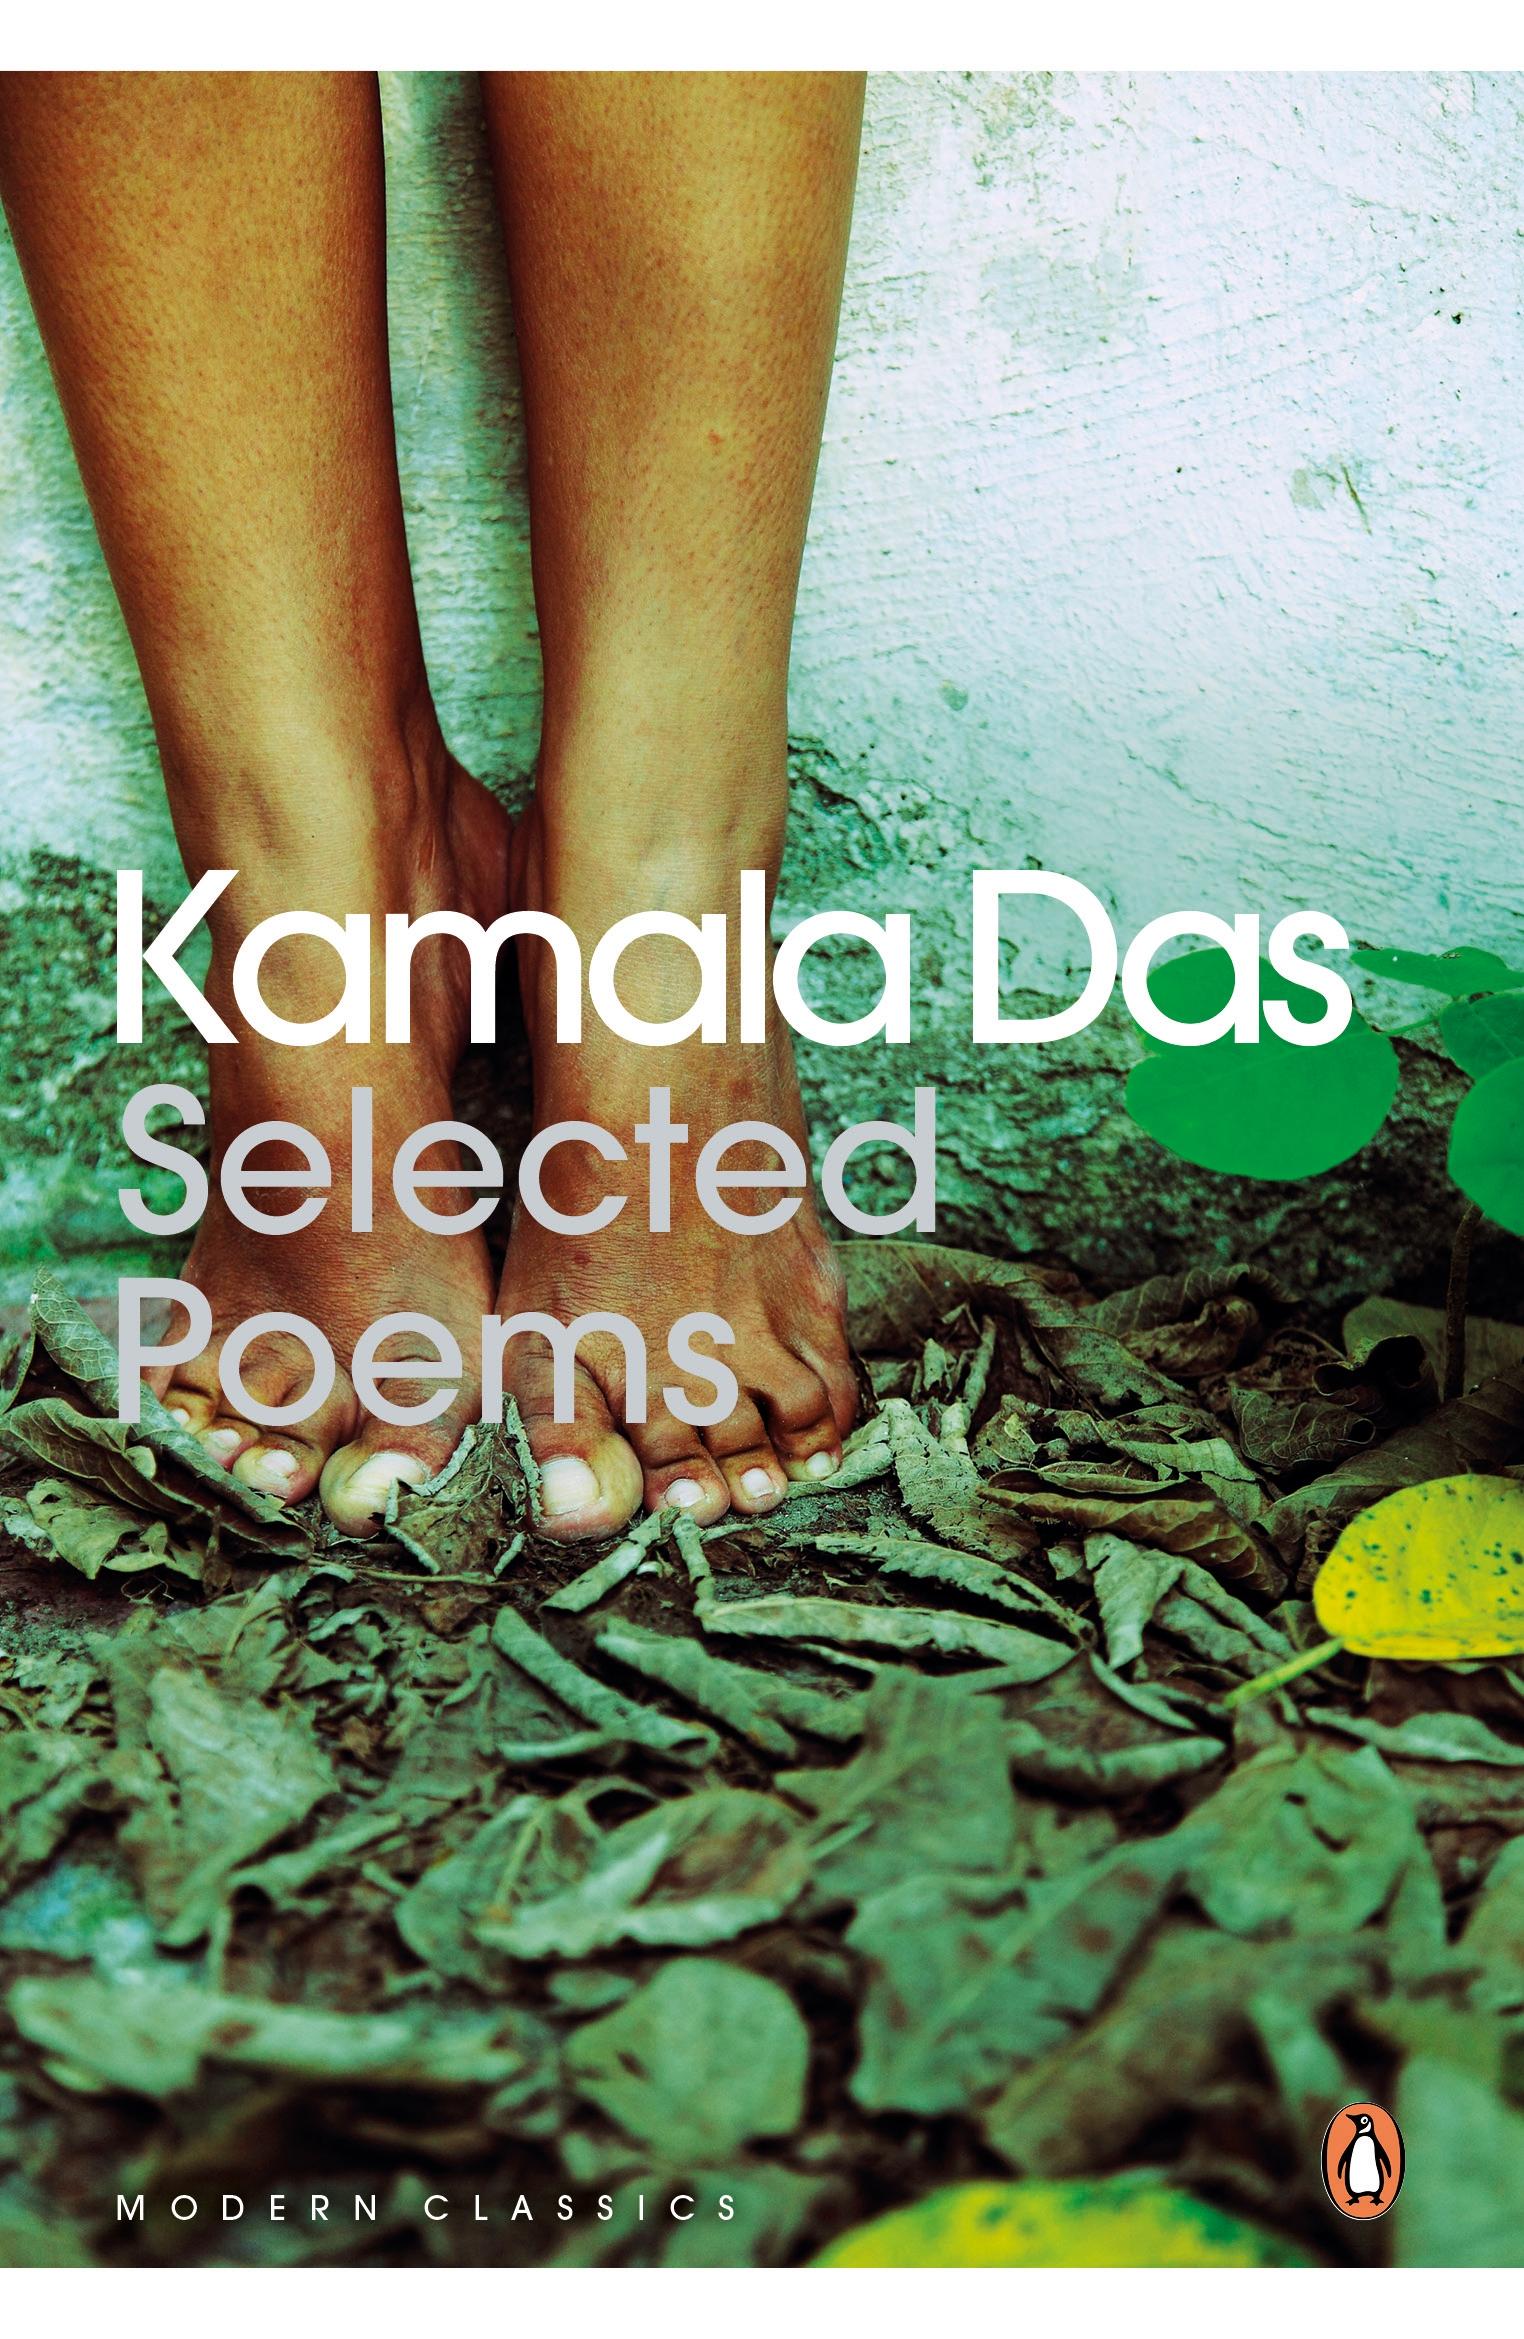 theme of kamala das poem an introduction